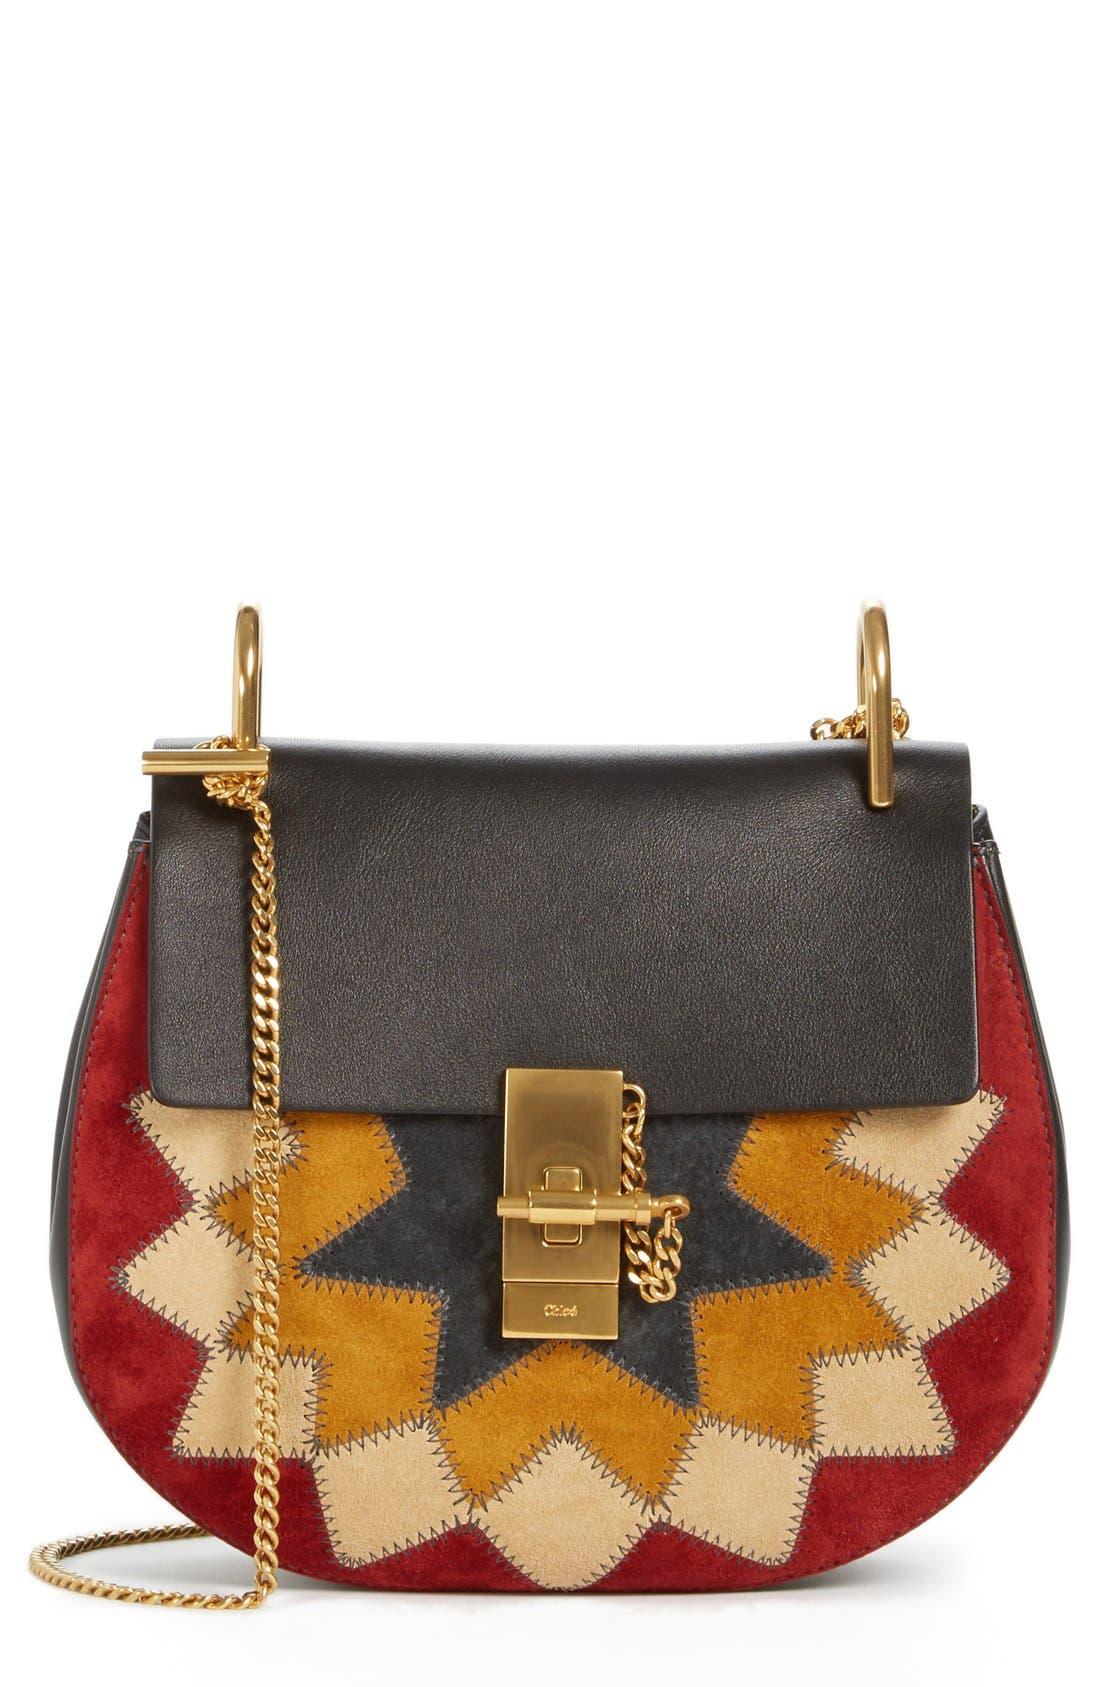 Alternate Image 1 Selected - Chloé 'Small Drew' Wonder Woman Patchwork Suede & Leather Shoulder Bag